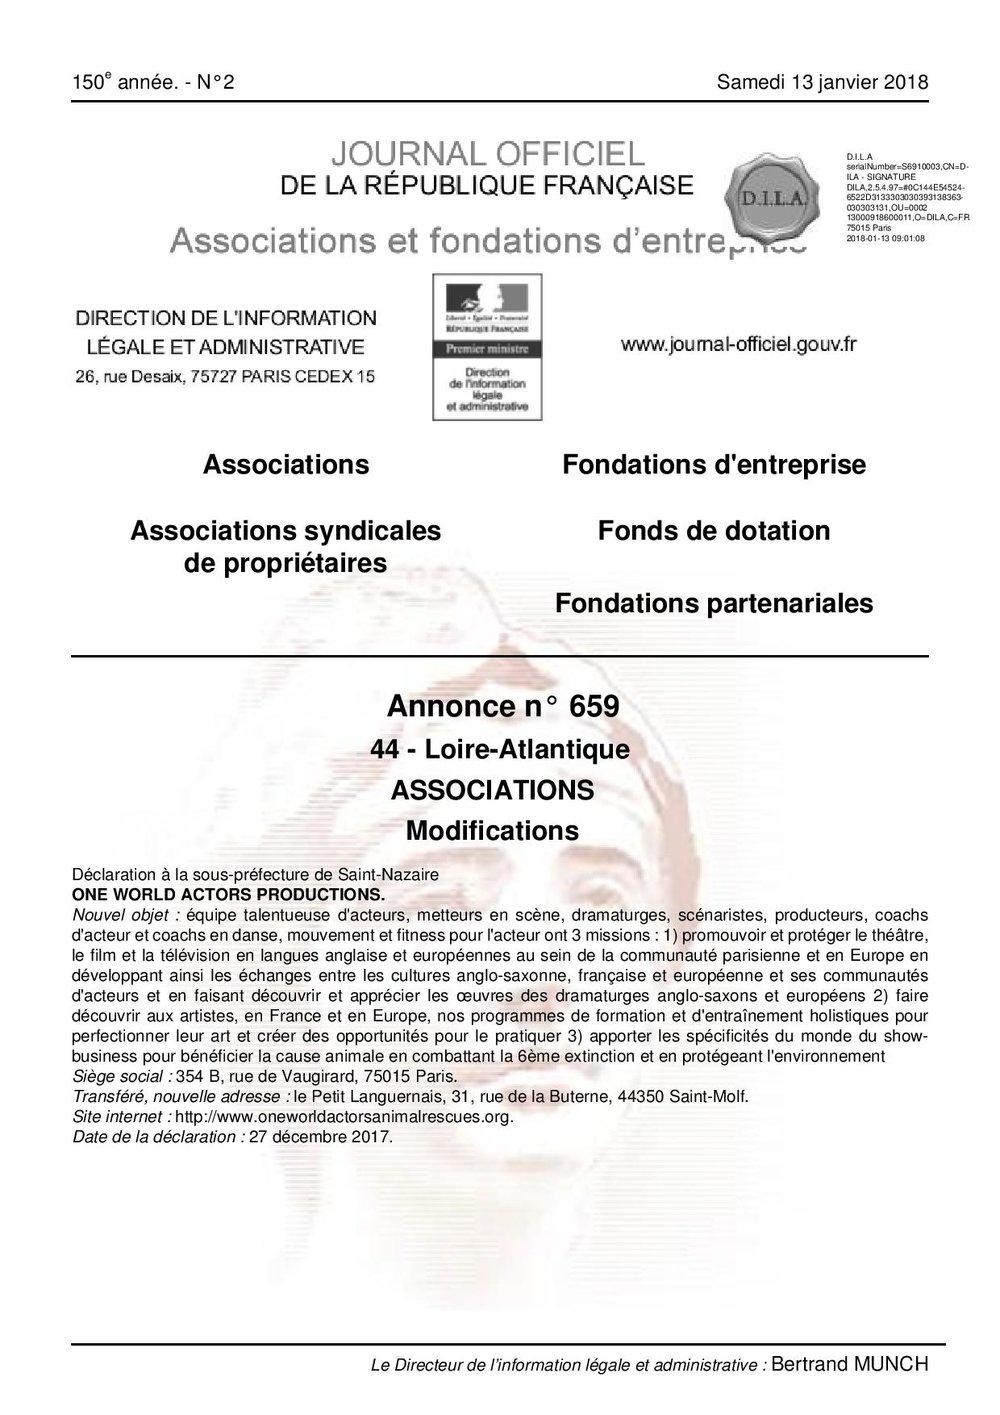 OWAP-AR 2018 JOAFE_PDF_Unitaire_20180002_00659-page-001.jpg